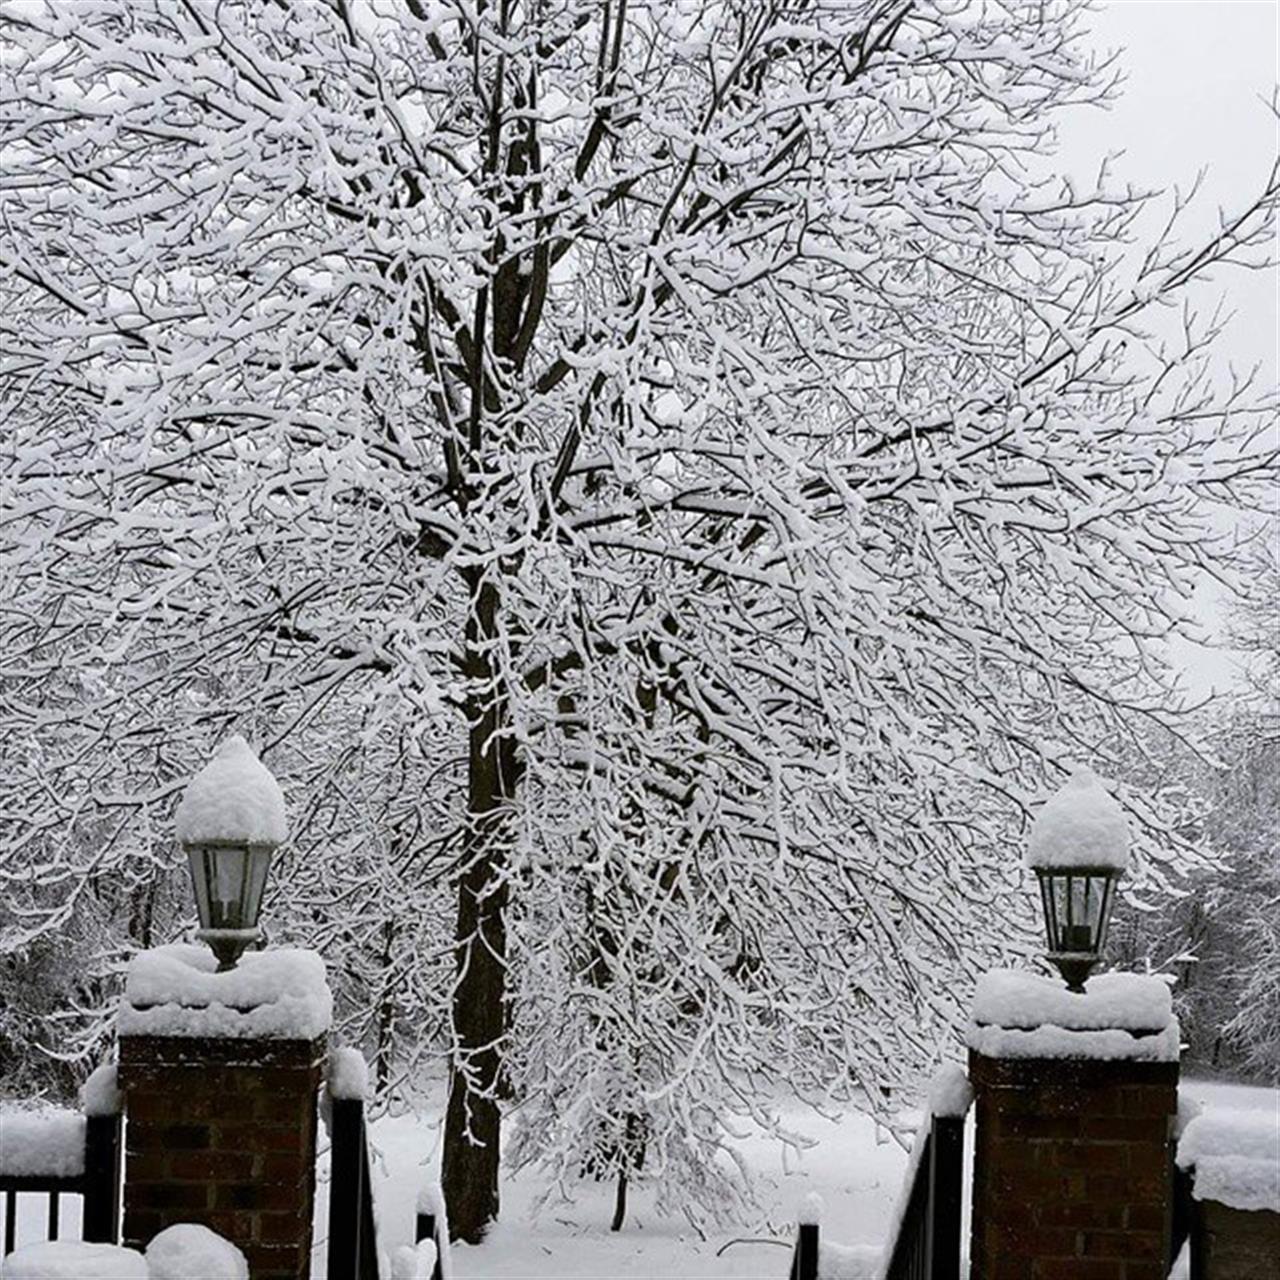 #leadingrelocal #elonnc #winterwonderland